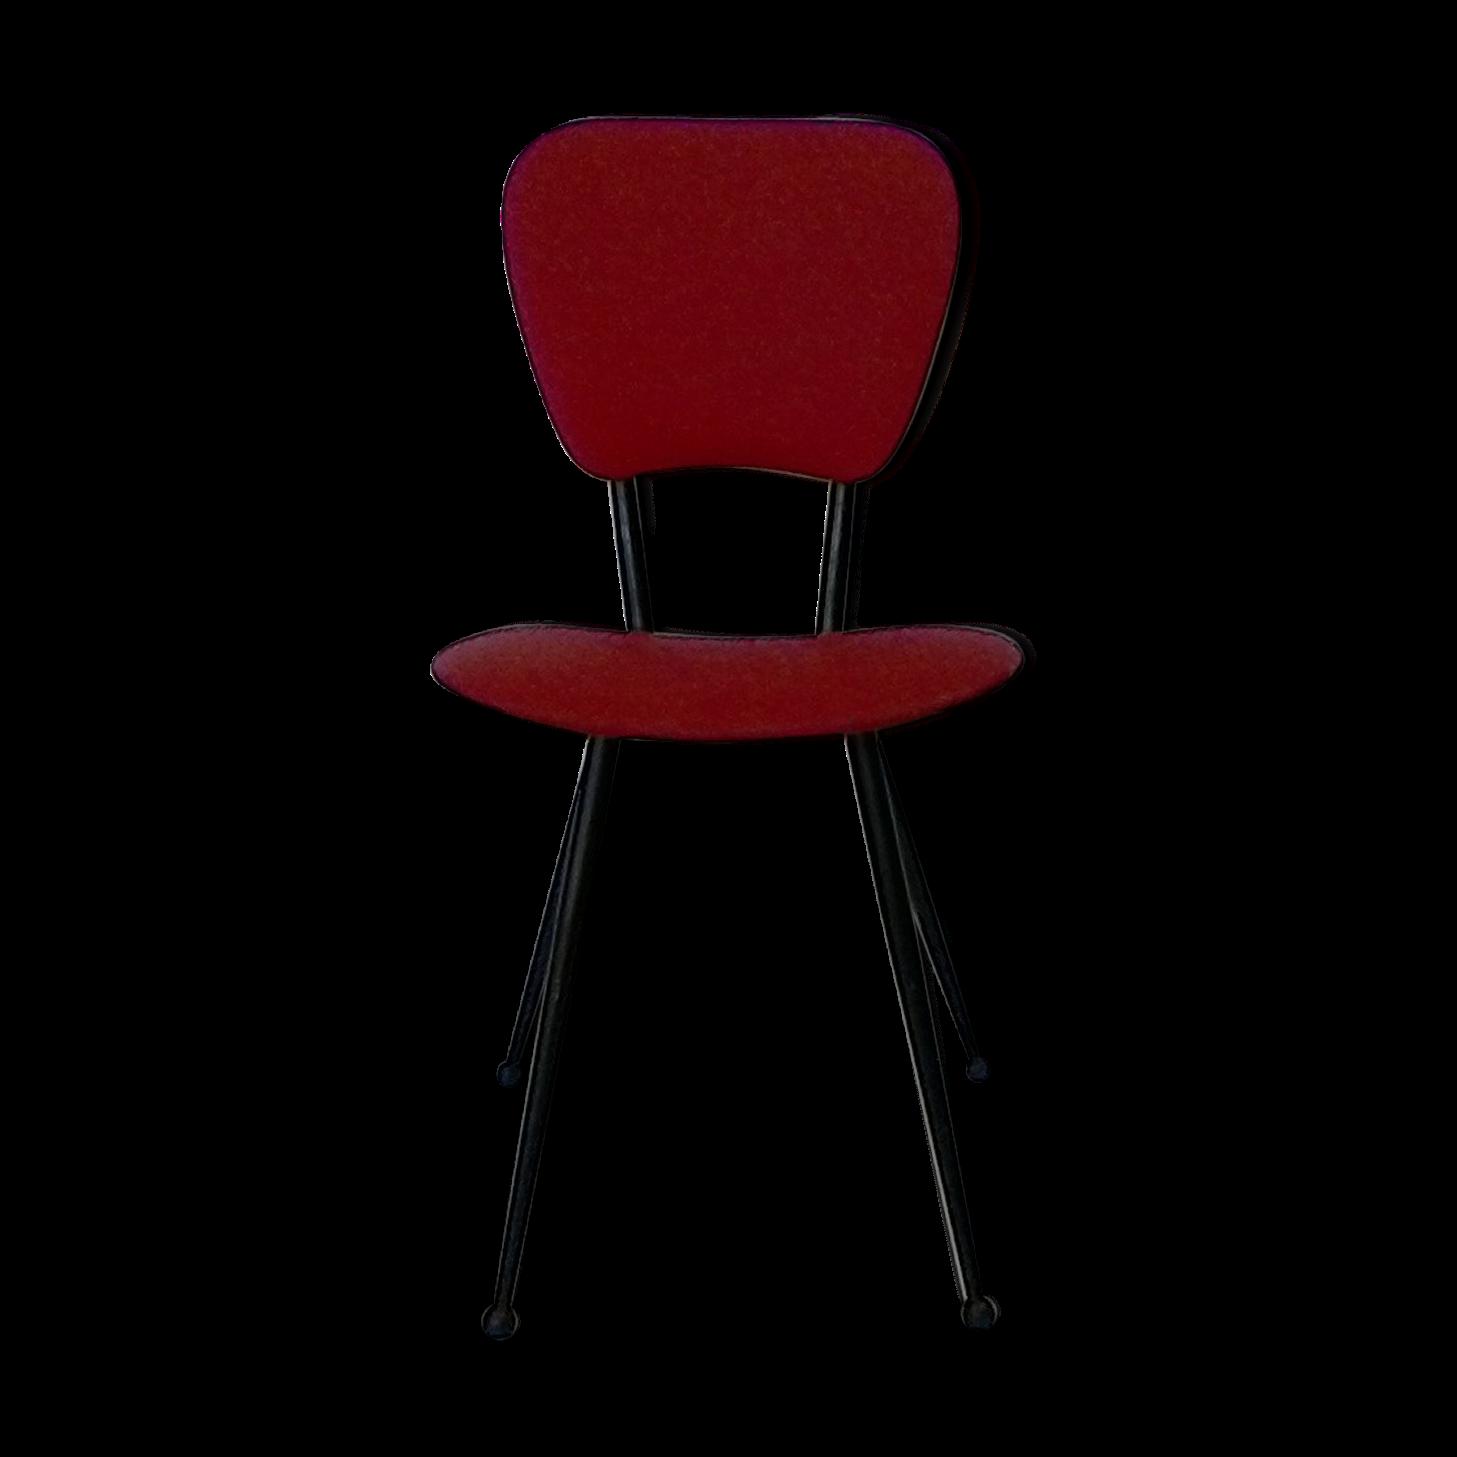 chaise paysanne rouge cheap best chaise cuisine pas cher. Black Bedroom Furniture Sets. Home Design Ideas